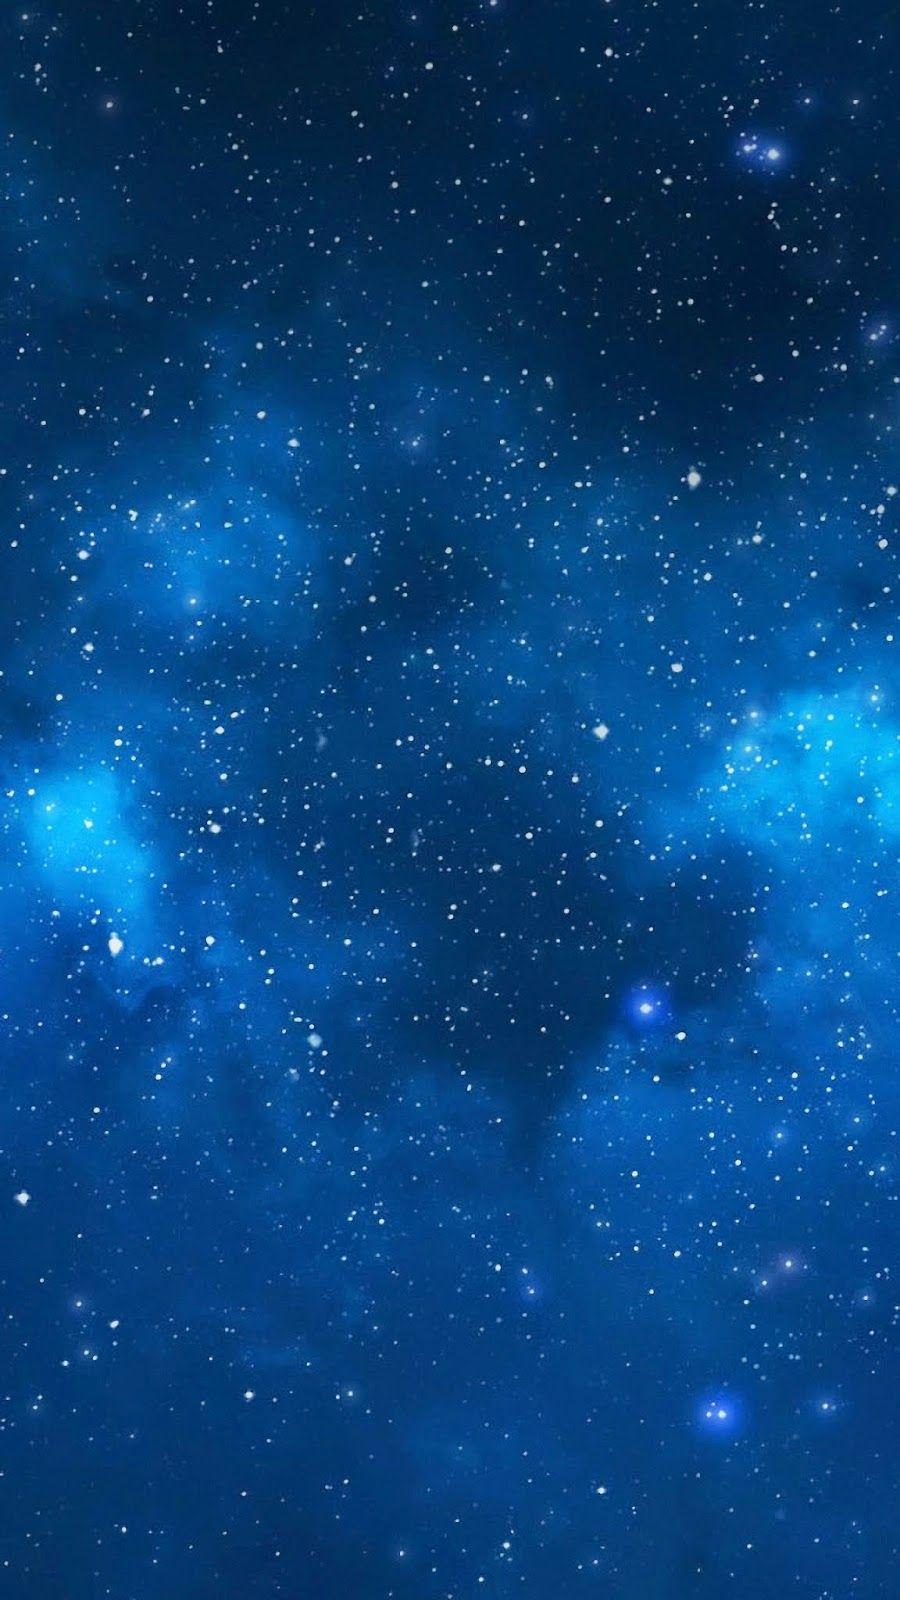 Samsung Galaxy S6 S6 Edge Hd Wallpapers Blue Background Wallpapers Dark Blue Wallpaper Blue Galaxy Wallpaper